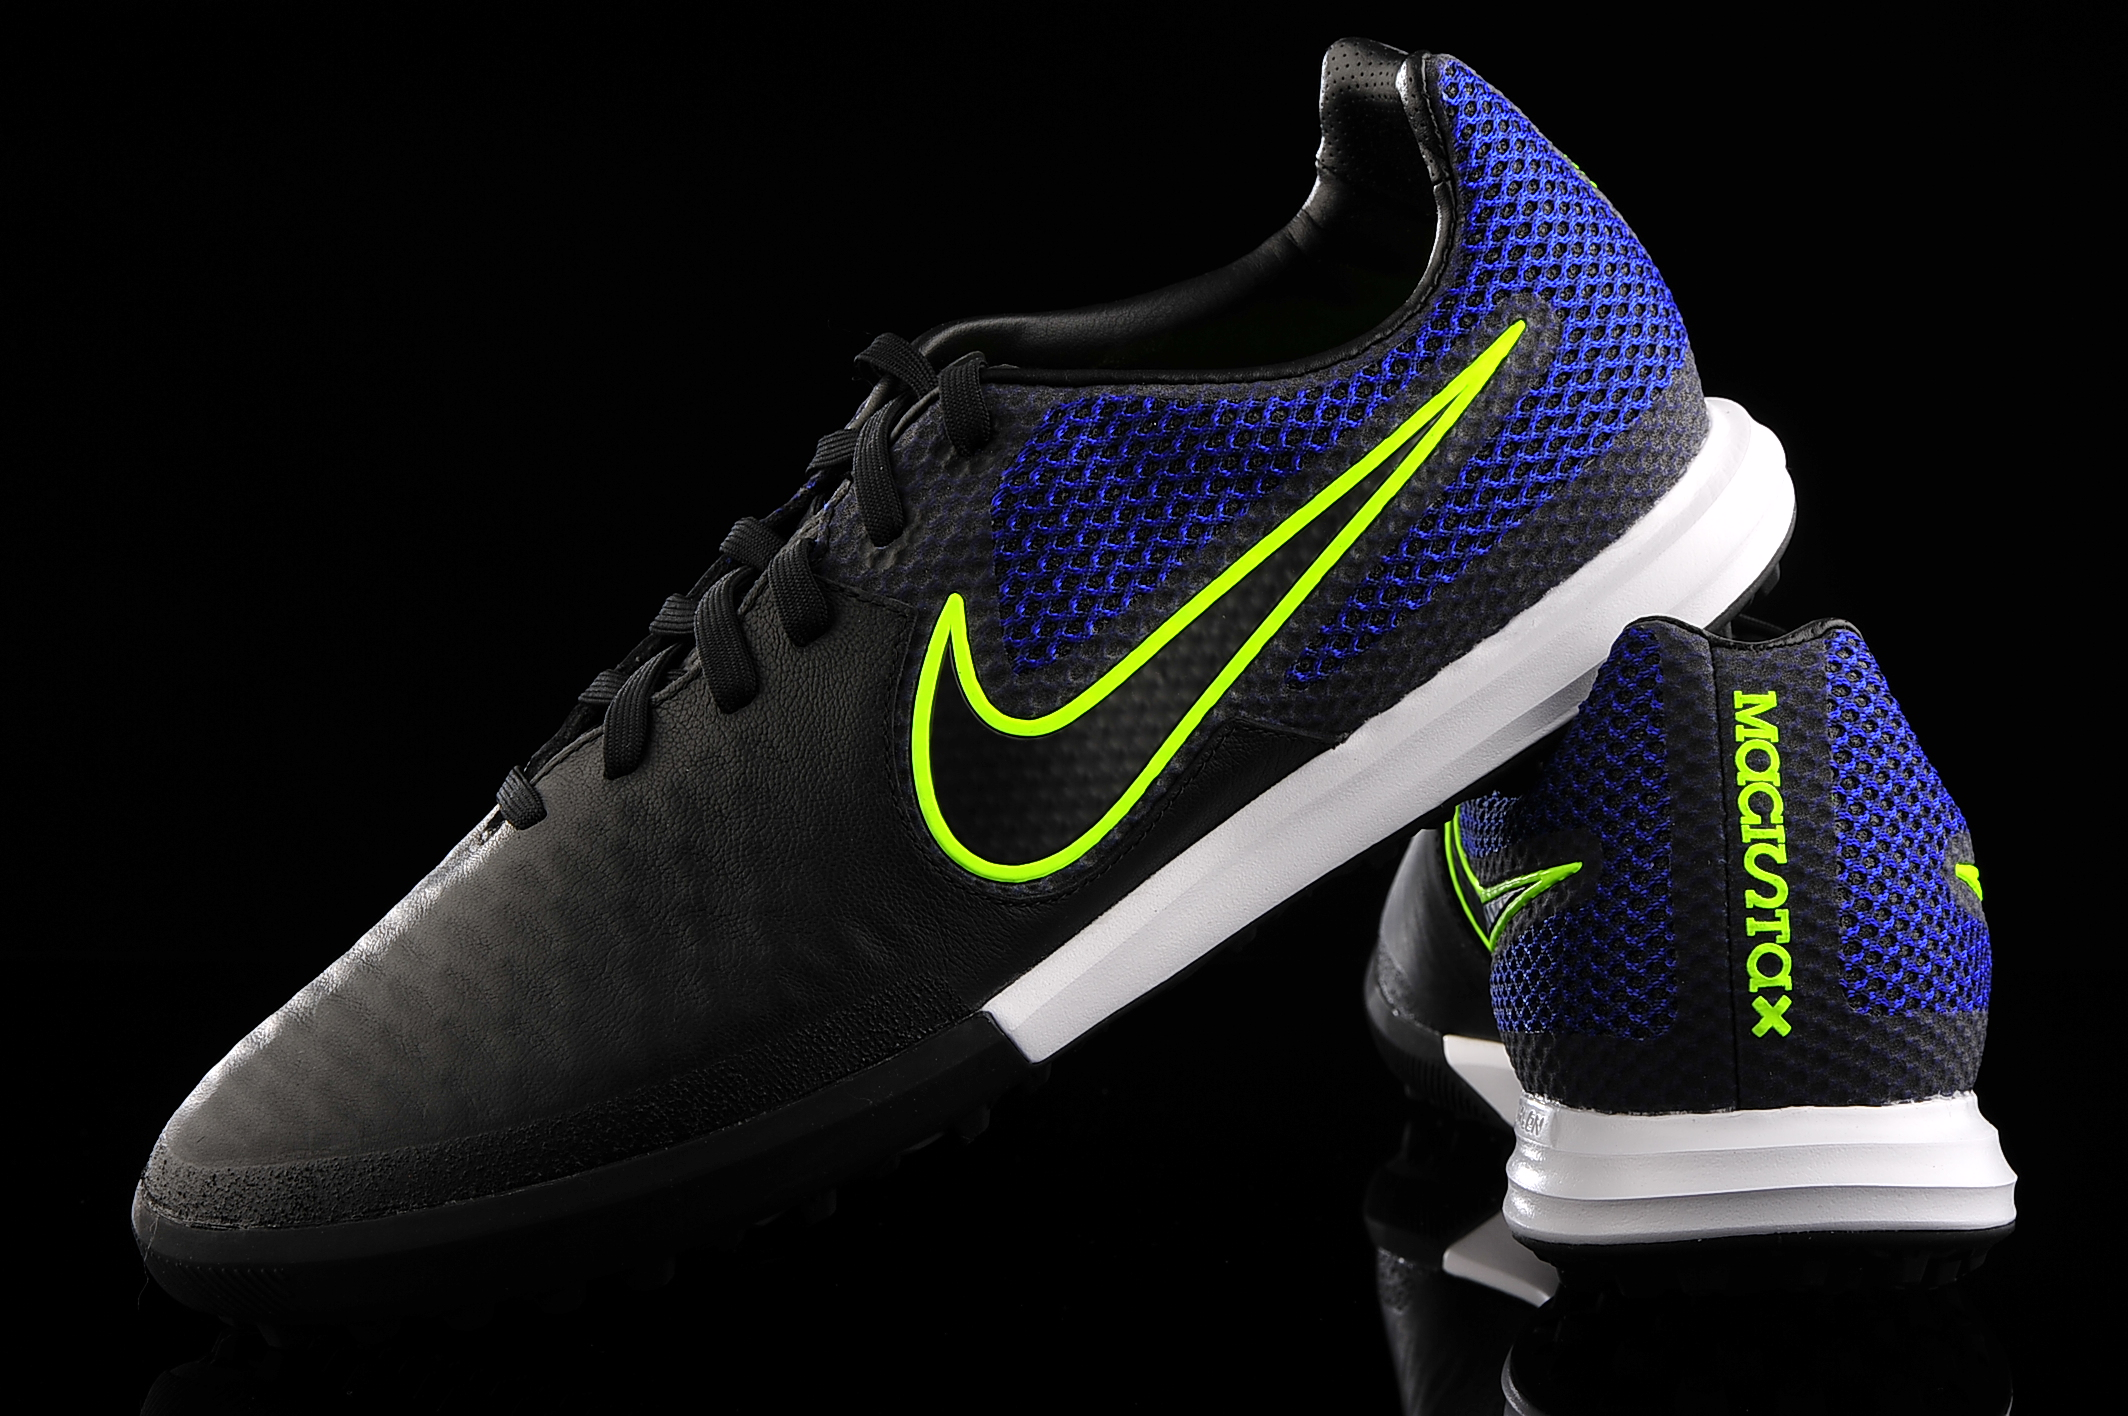 lote Circunstancias imprevistas molestarse  Nike MagistaX Finale TF 807567-008   R-GOL.com - Football boots & equipment